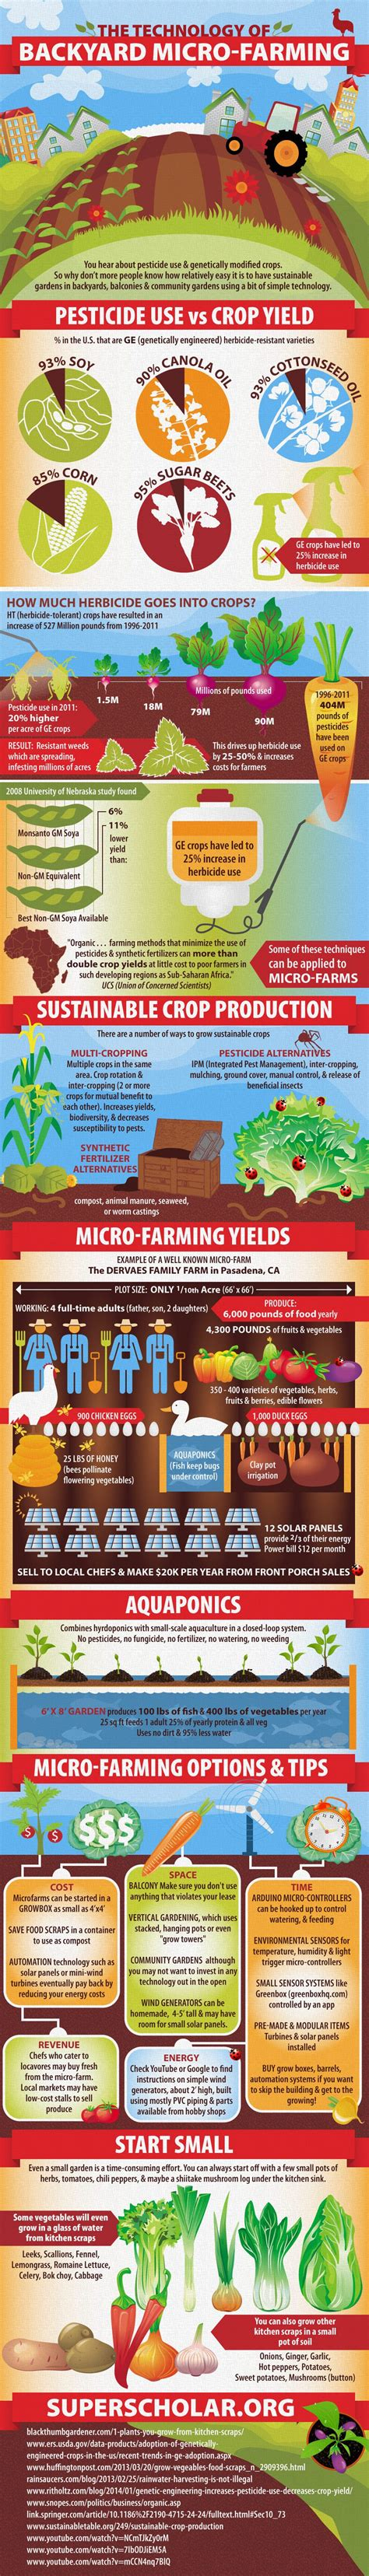 backyard farming blog the technology of backyard micro farming super scholar